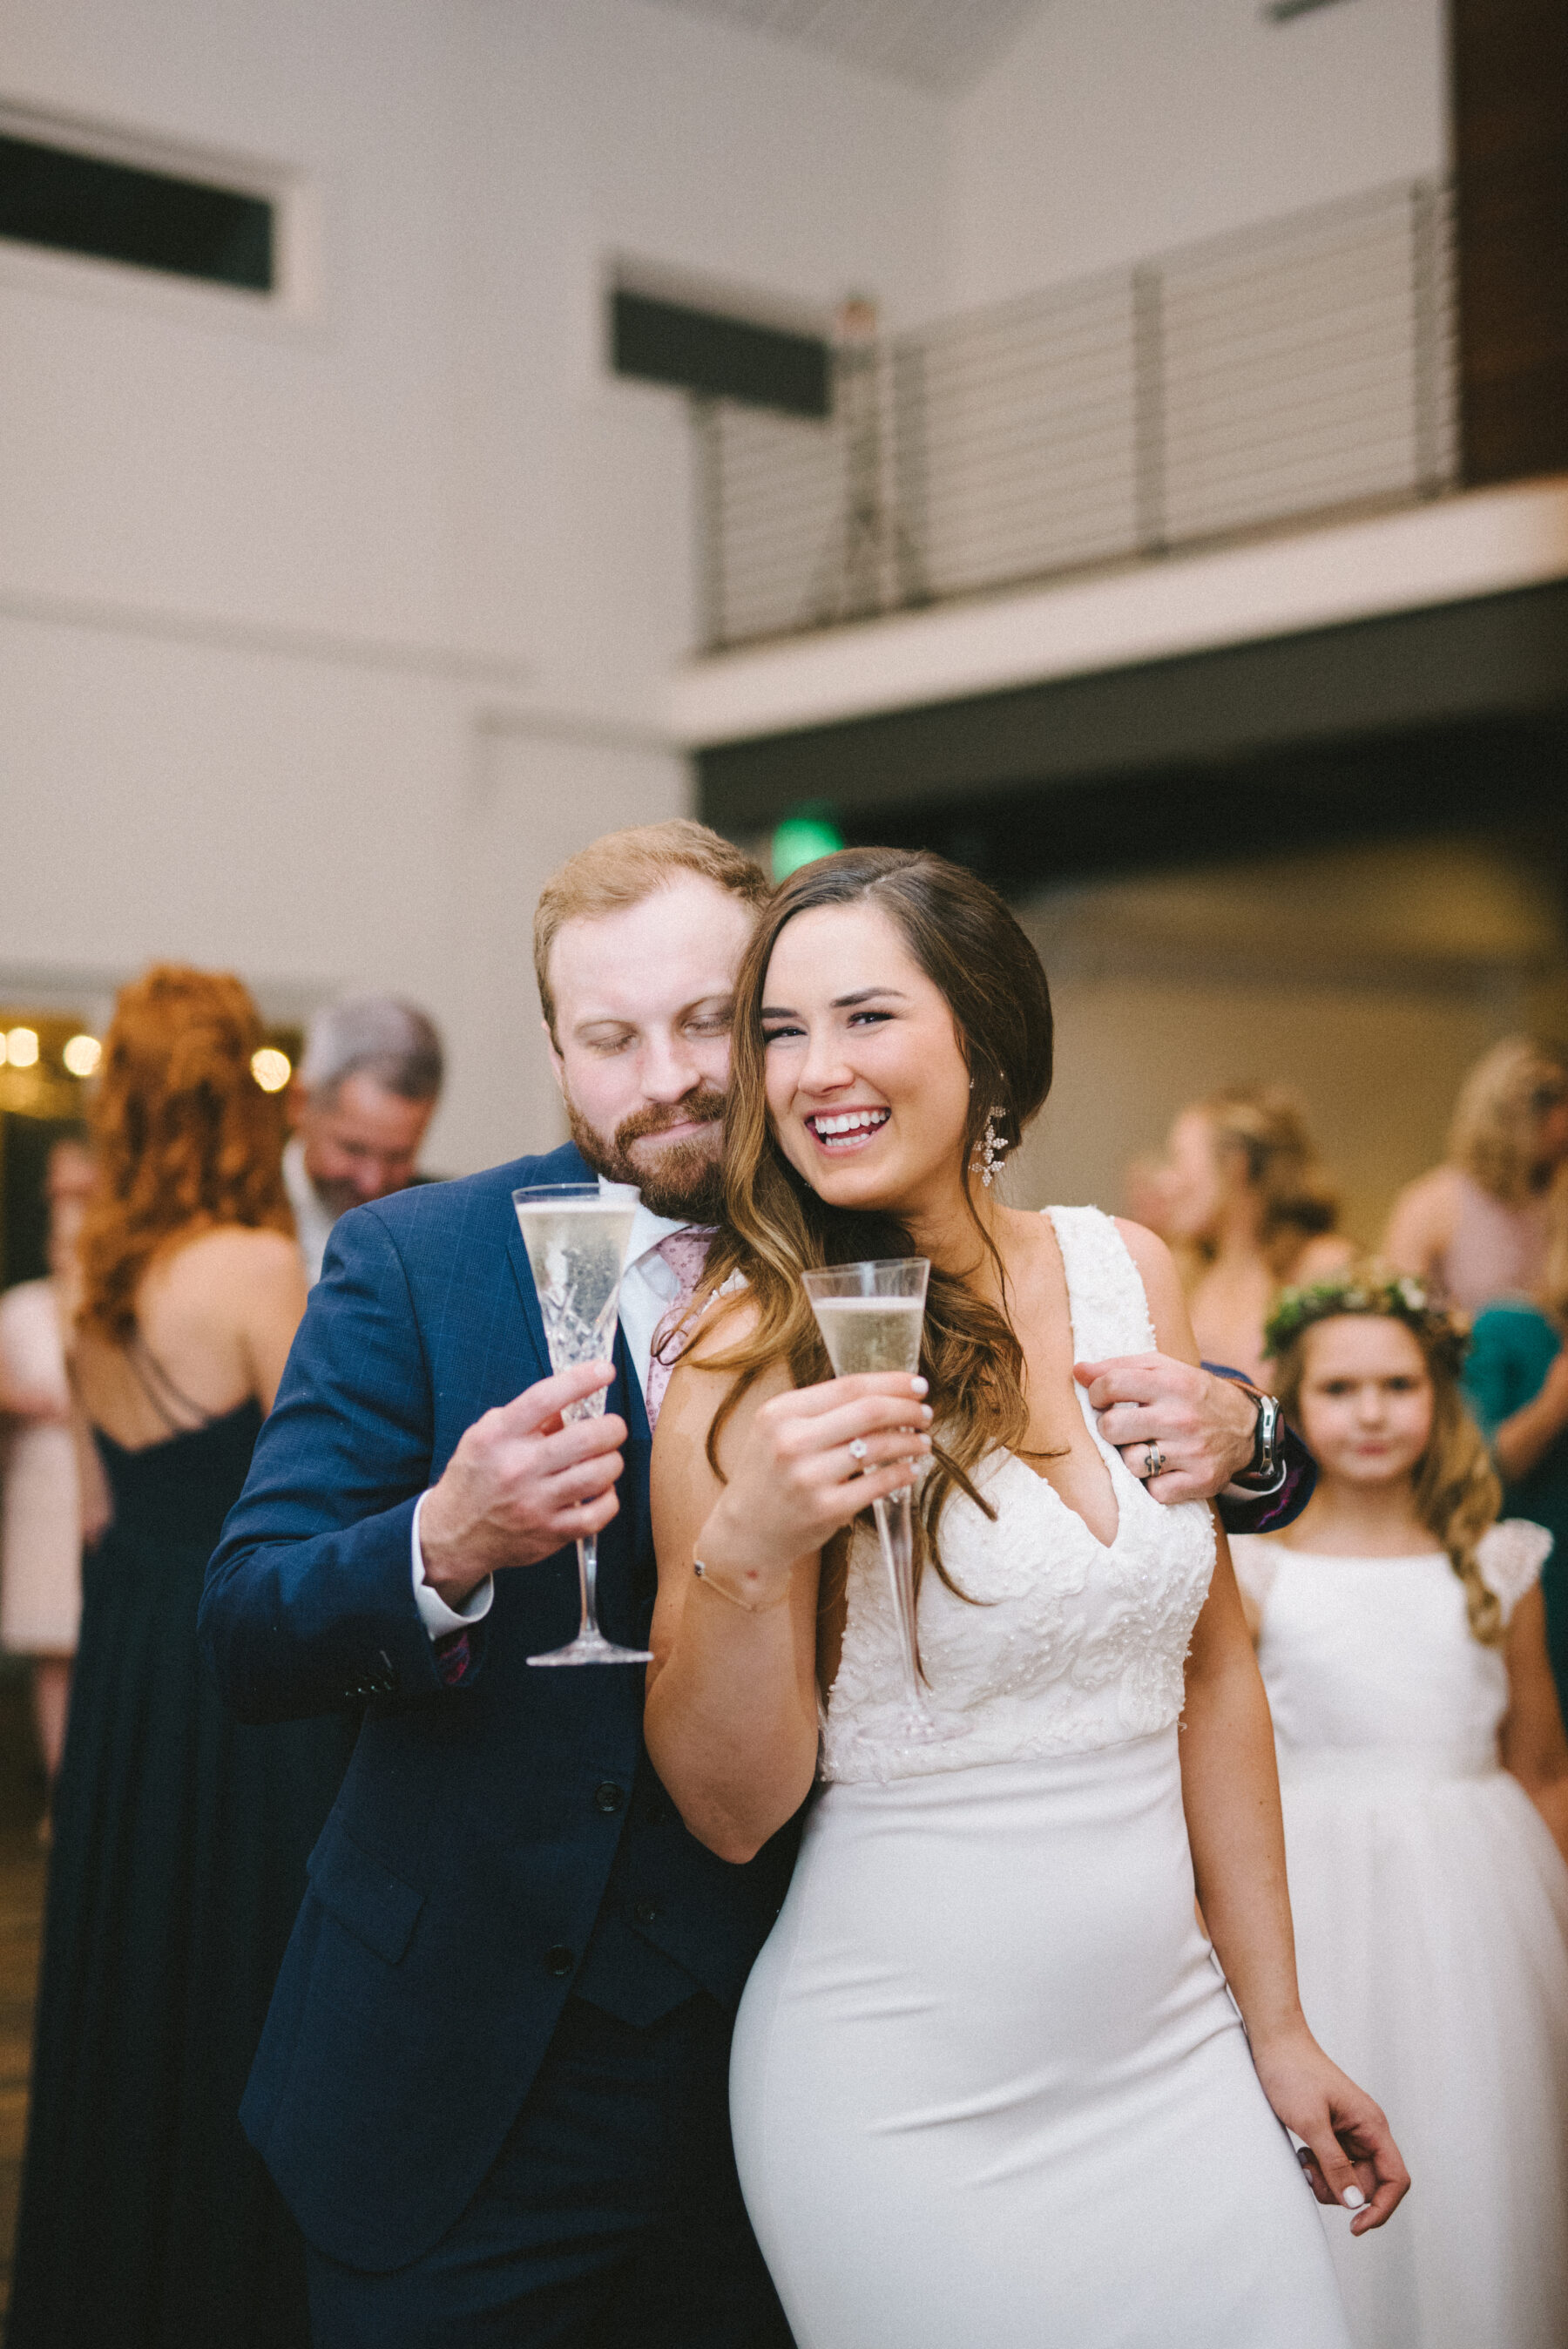 Kera Photography   Nashville Bride Guide